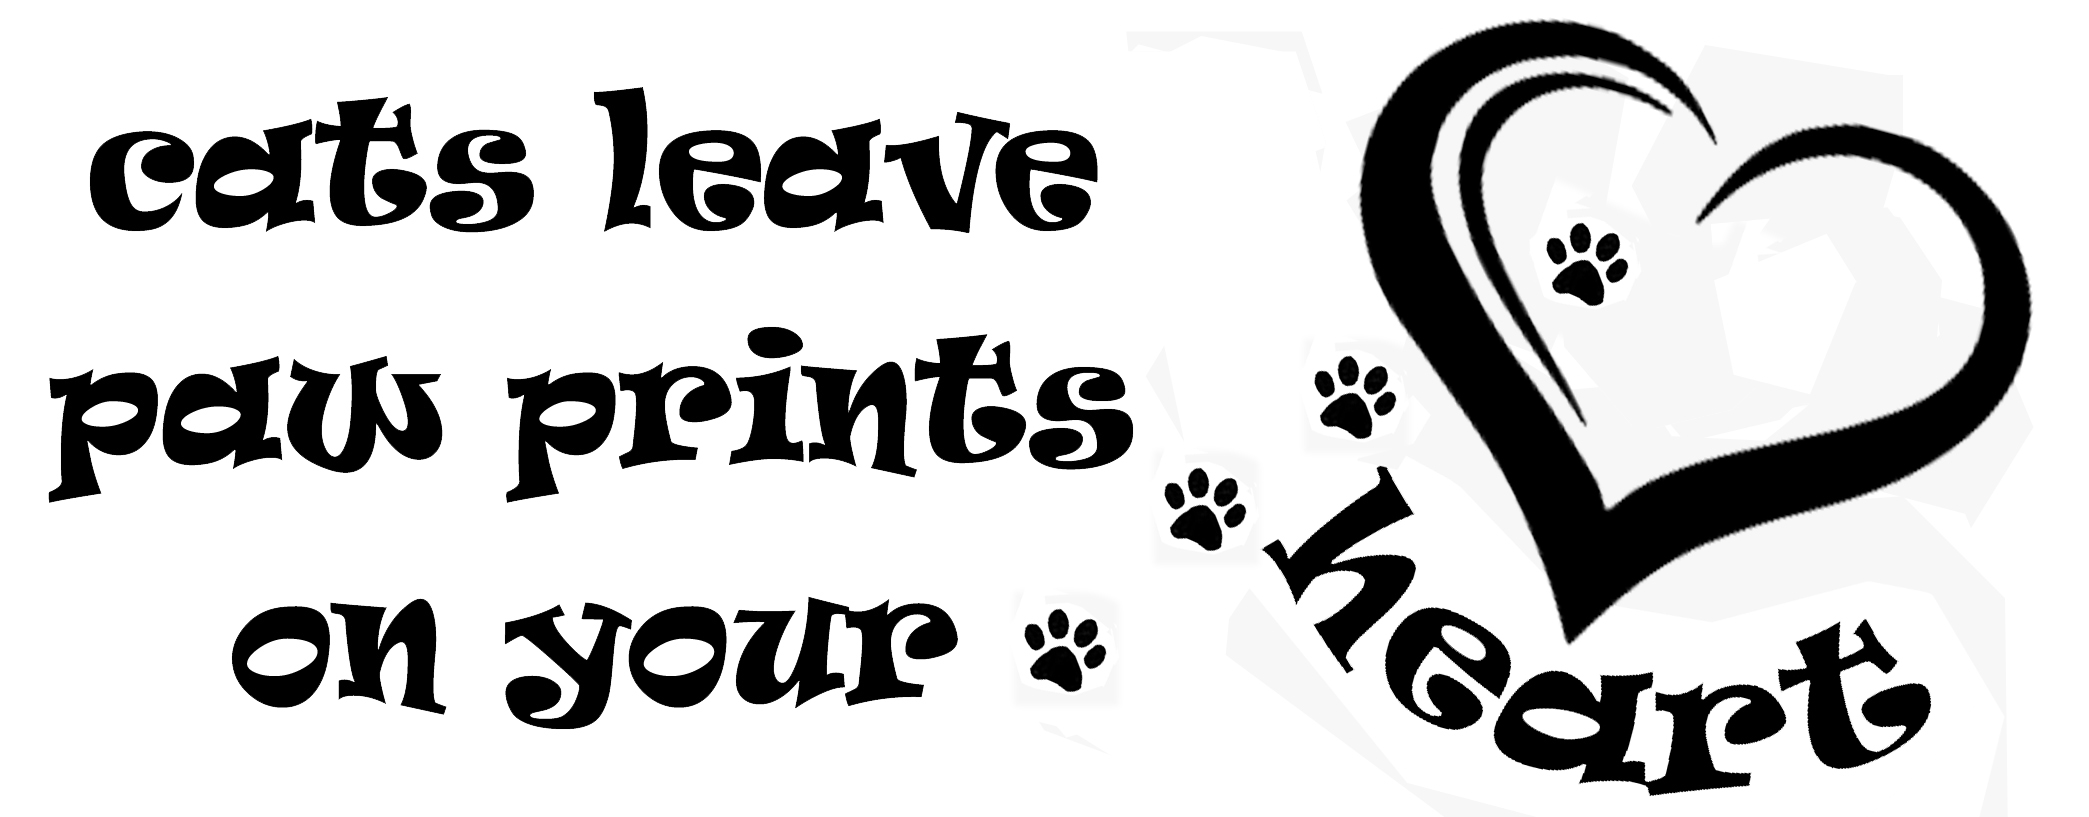 PET7: Cat leaves paw print